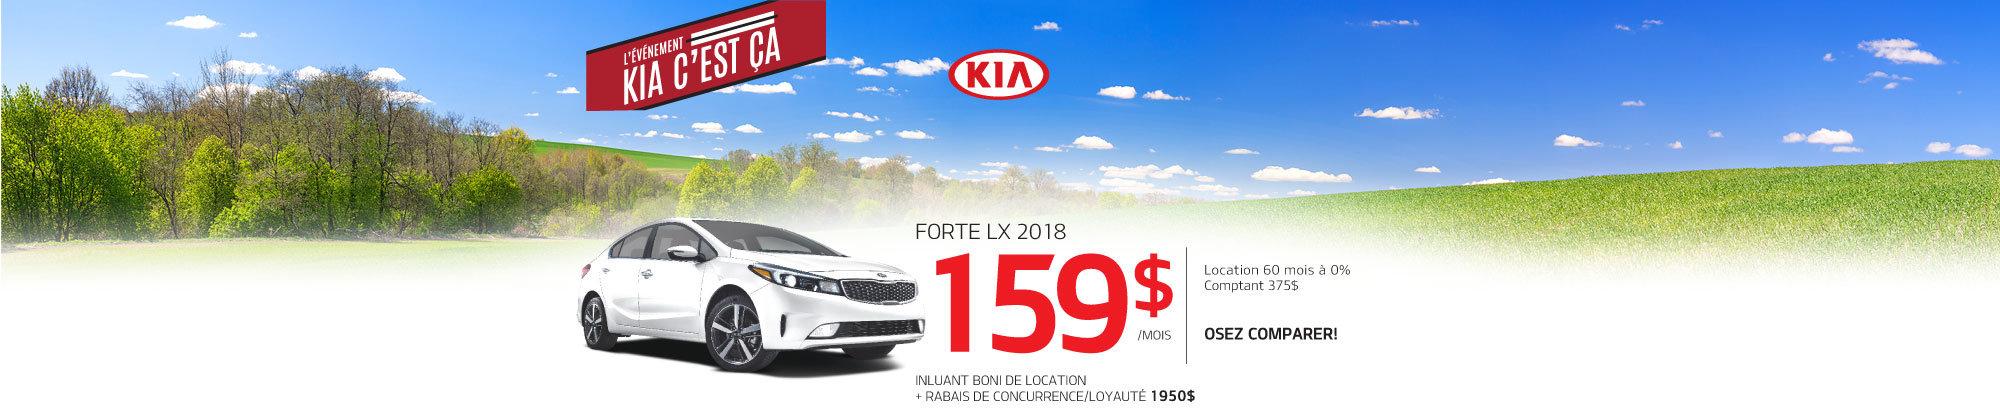 Forte LX 2018 web